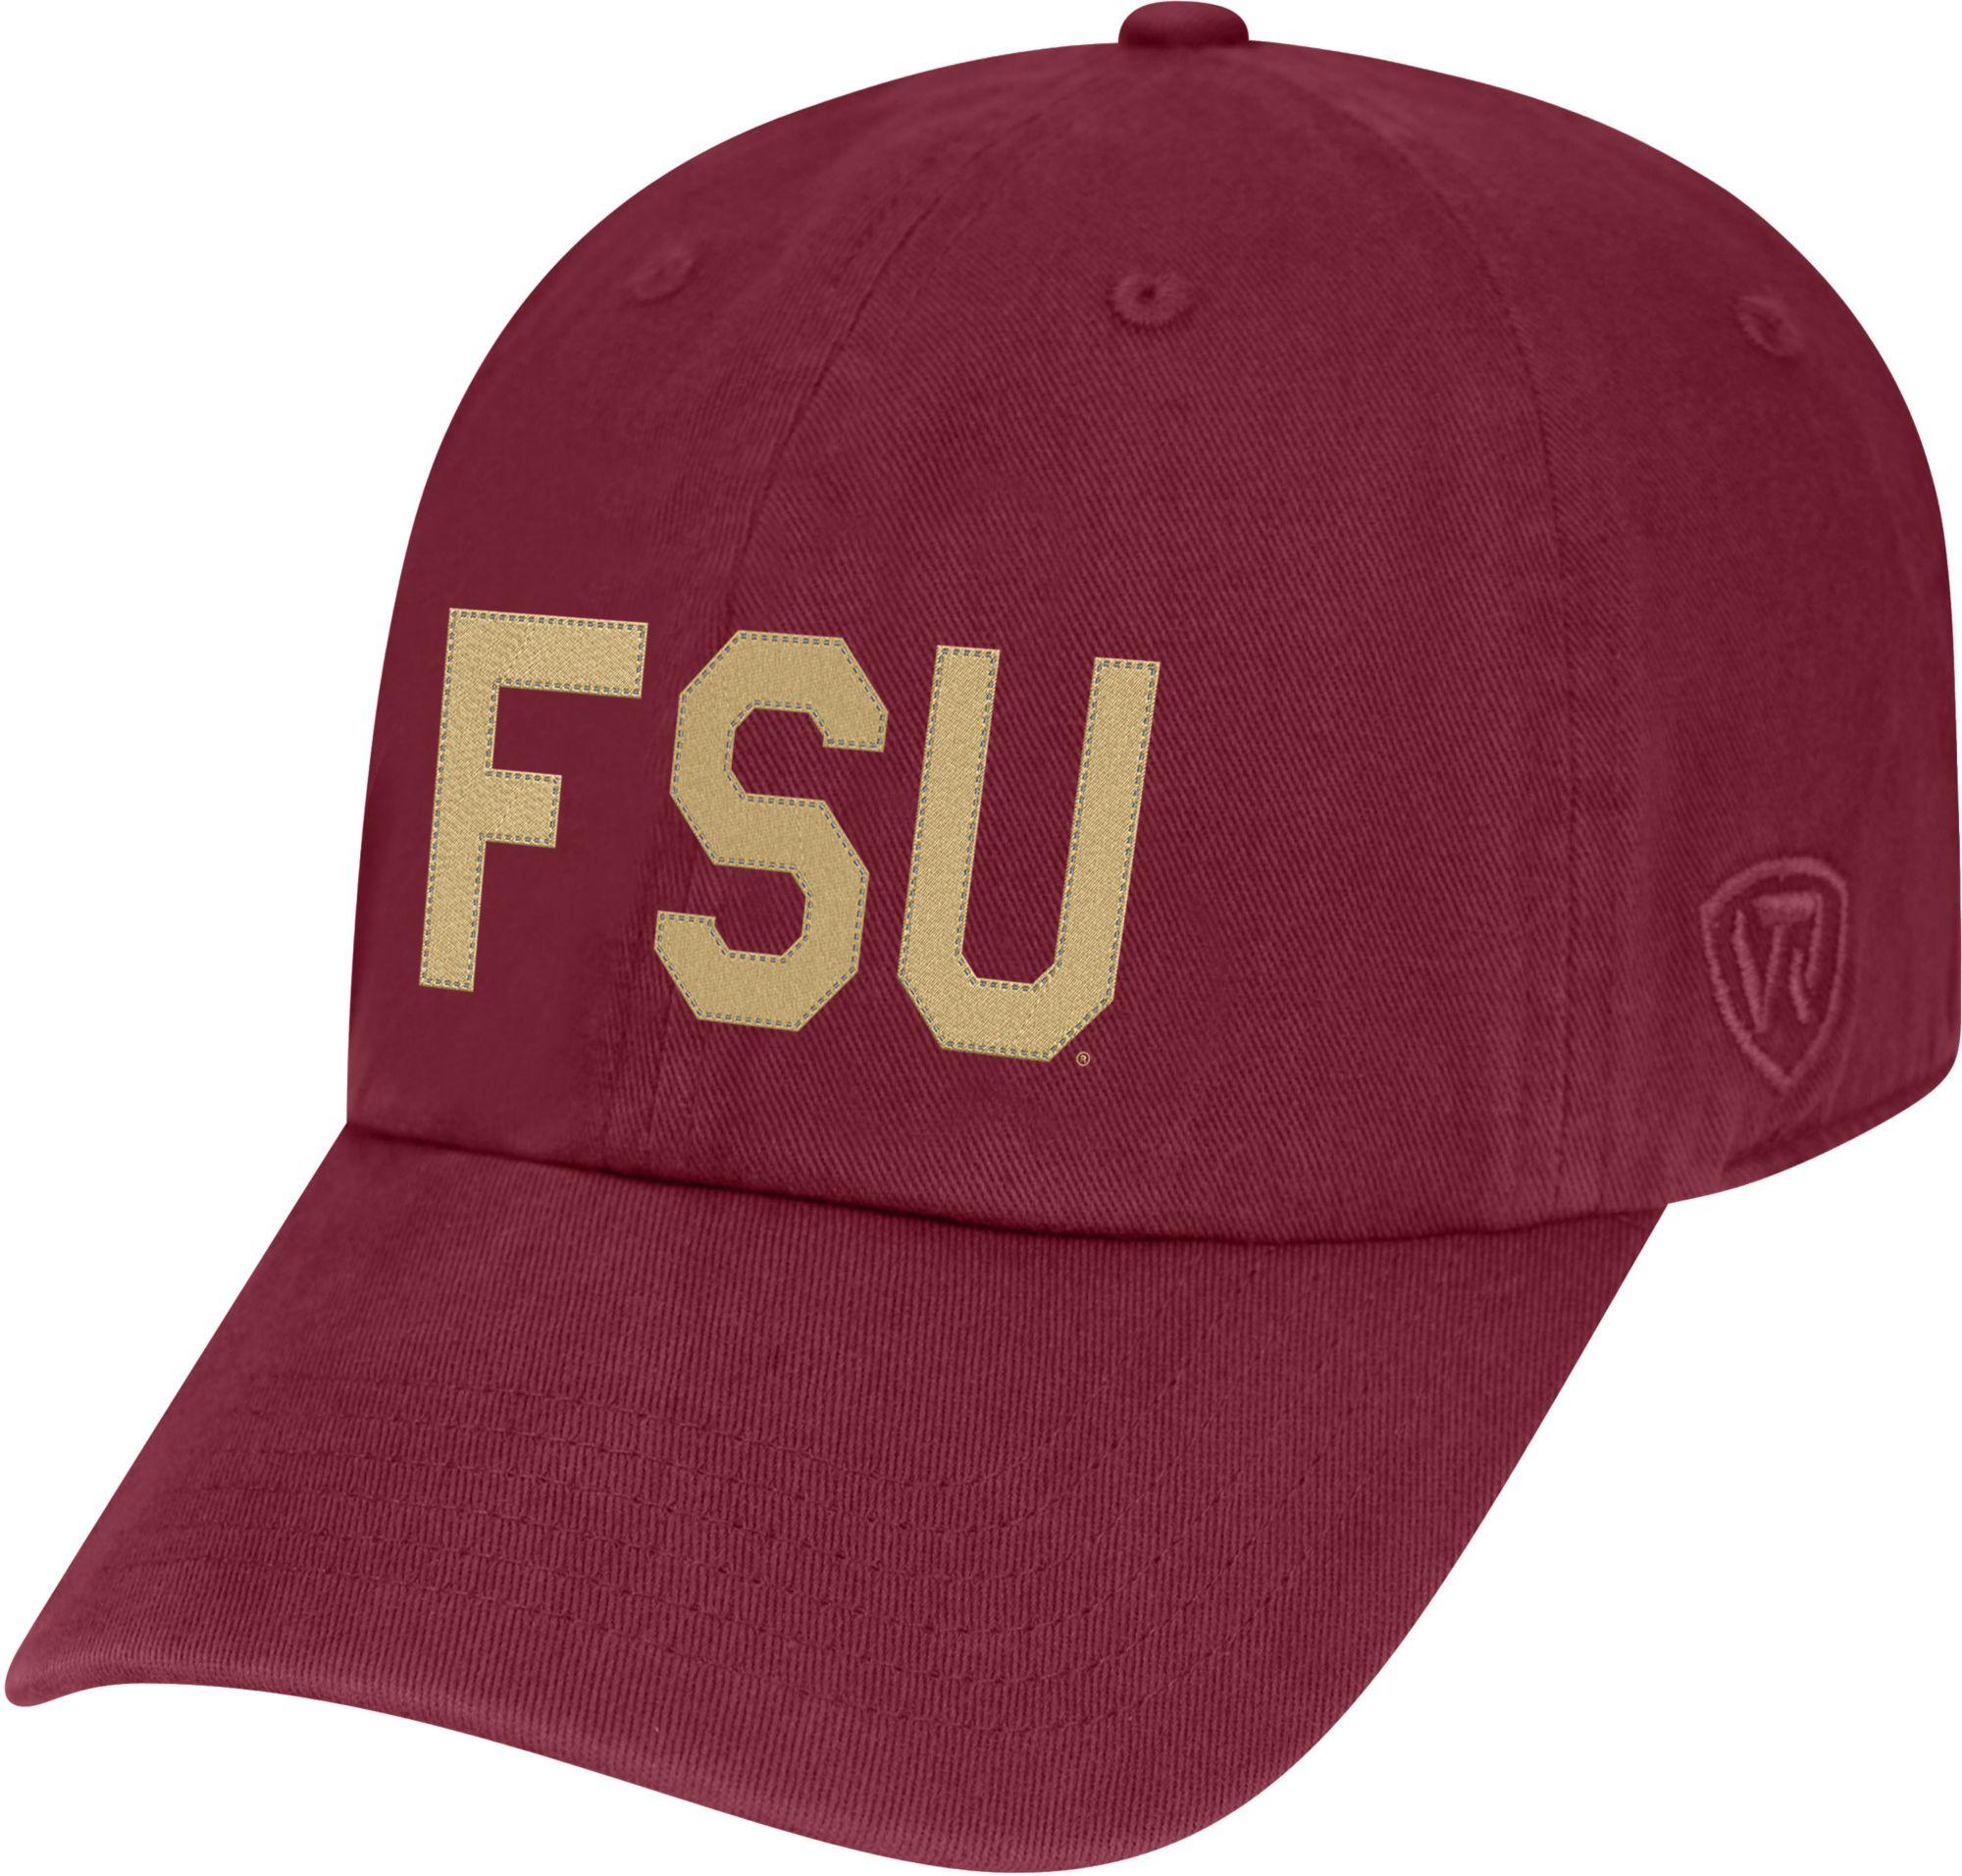 56c94f93c4ac47 ... get top of the world mens florida state seminoles garnet district  adjustable hat 16b05 36545